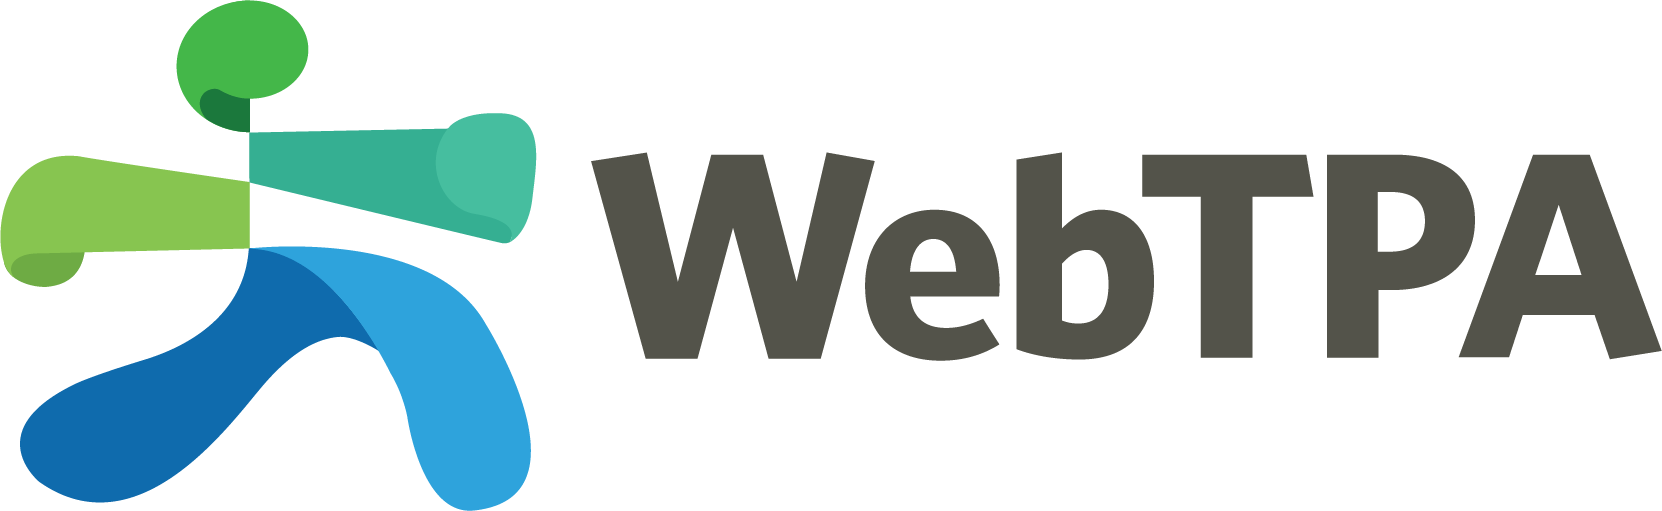 WebTPA logo